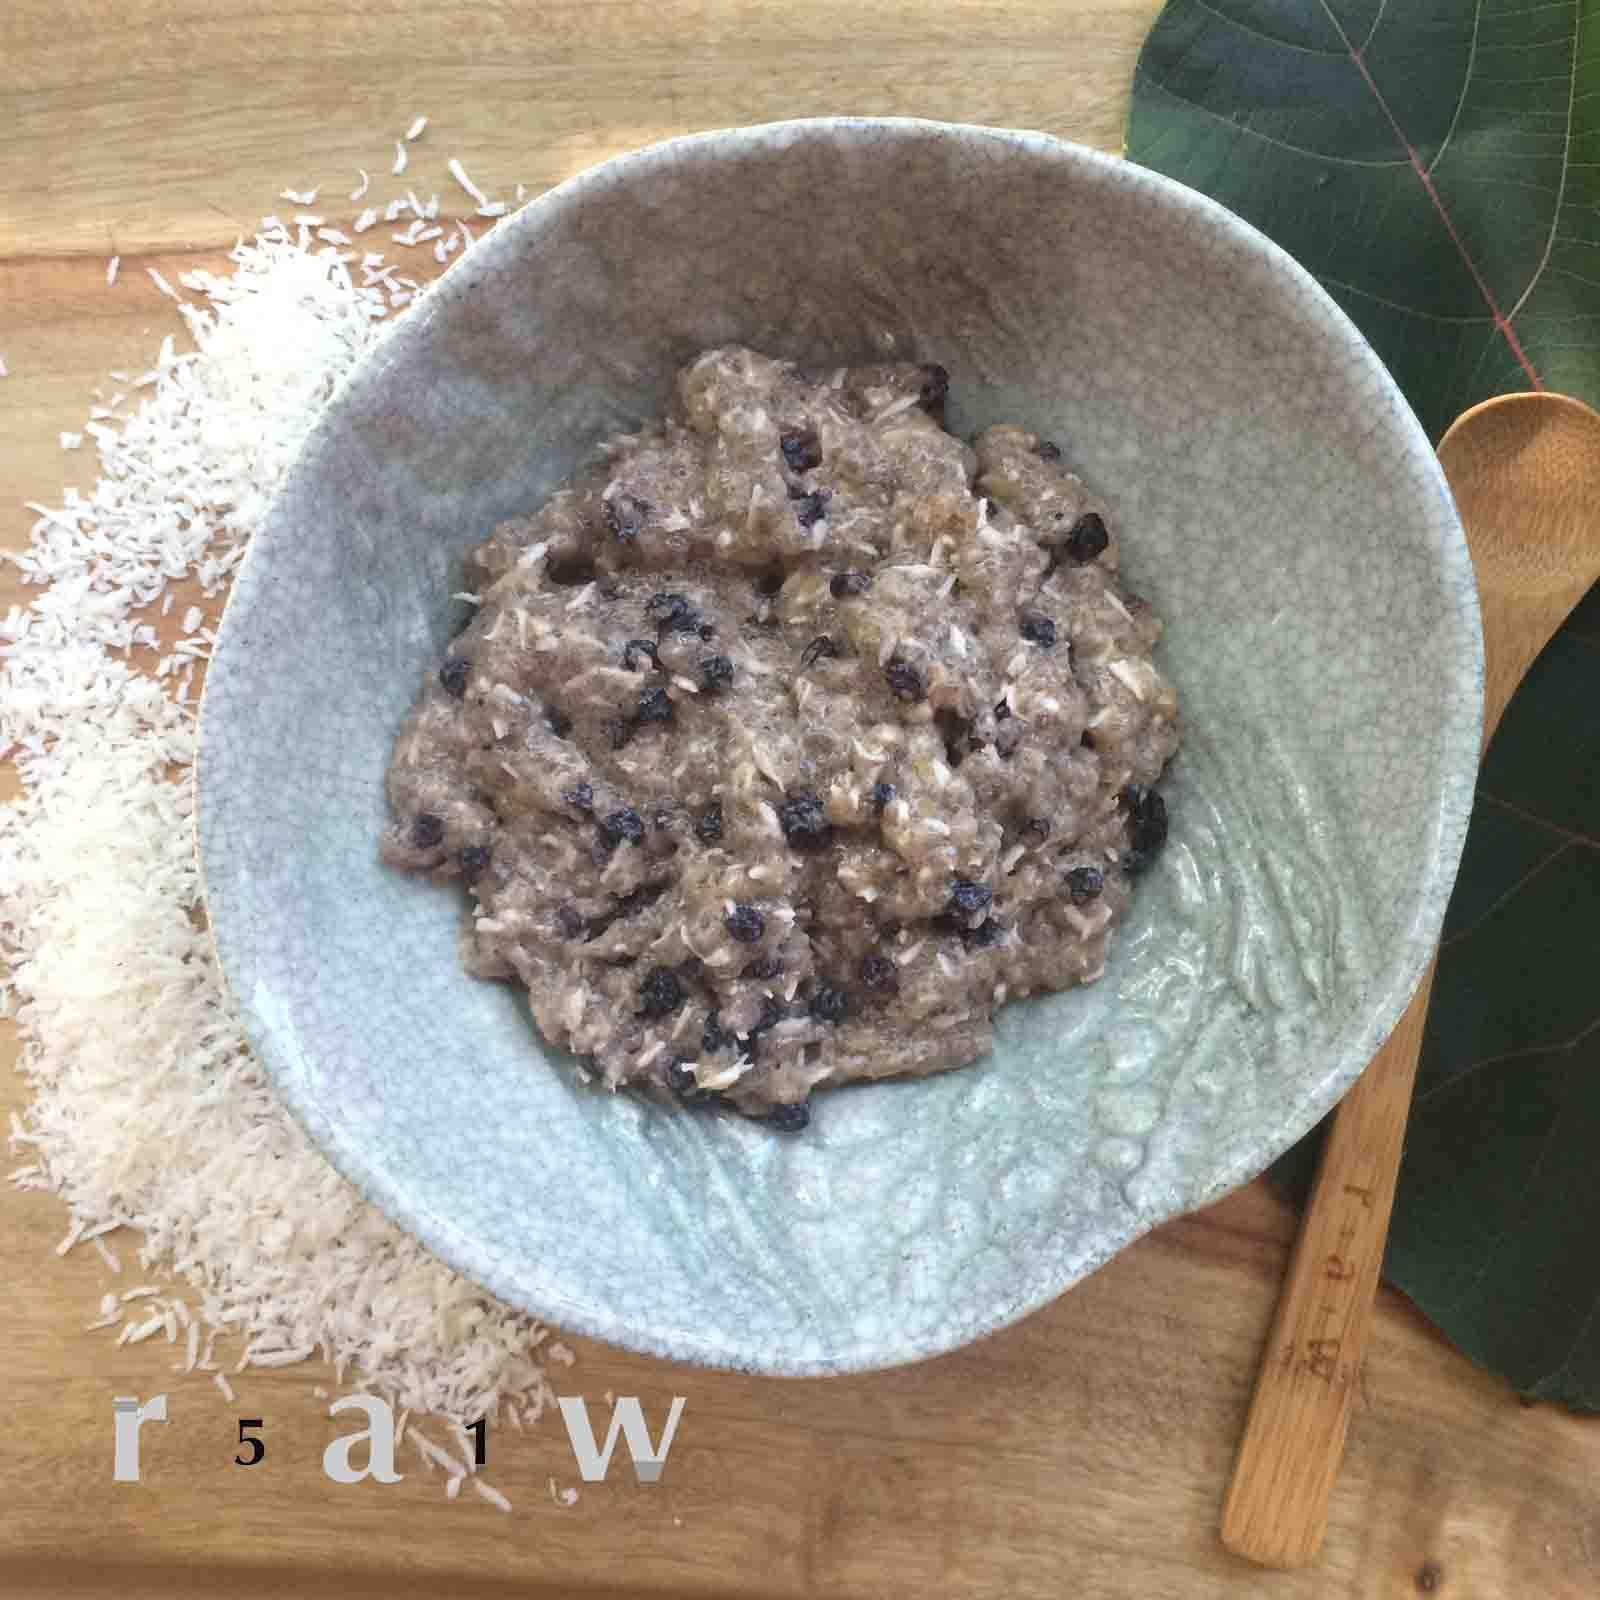 raw-food-diet-creamy-coconut-currant-chia-psyllium-husk-pudding-51raw.com.jpg